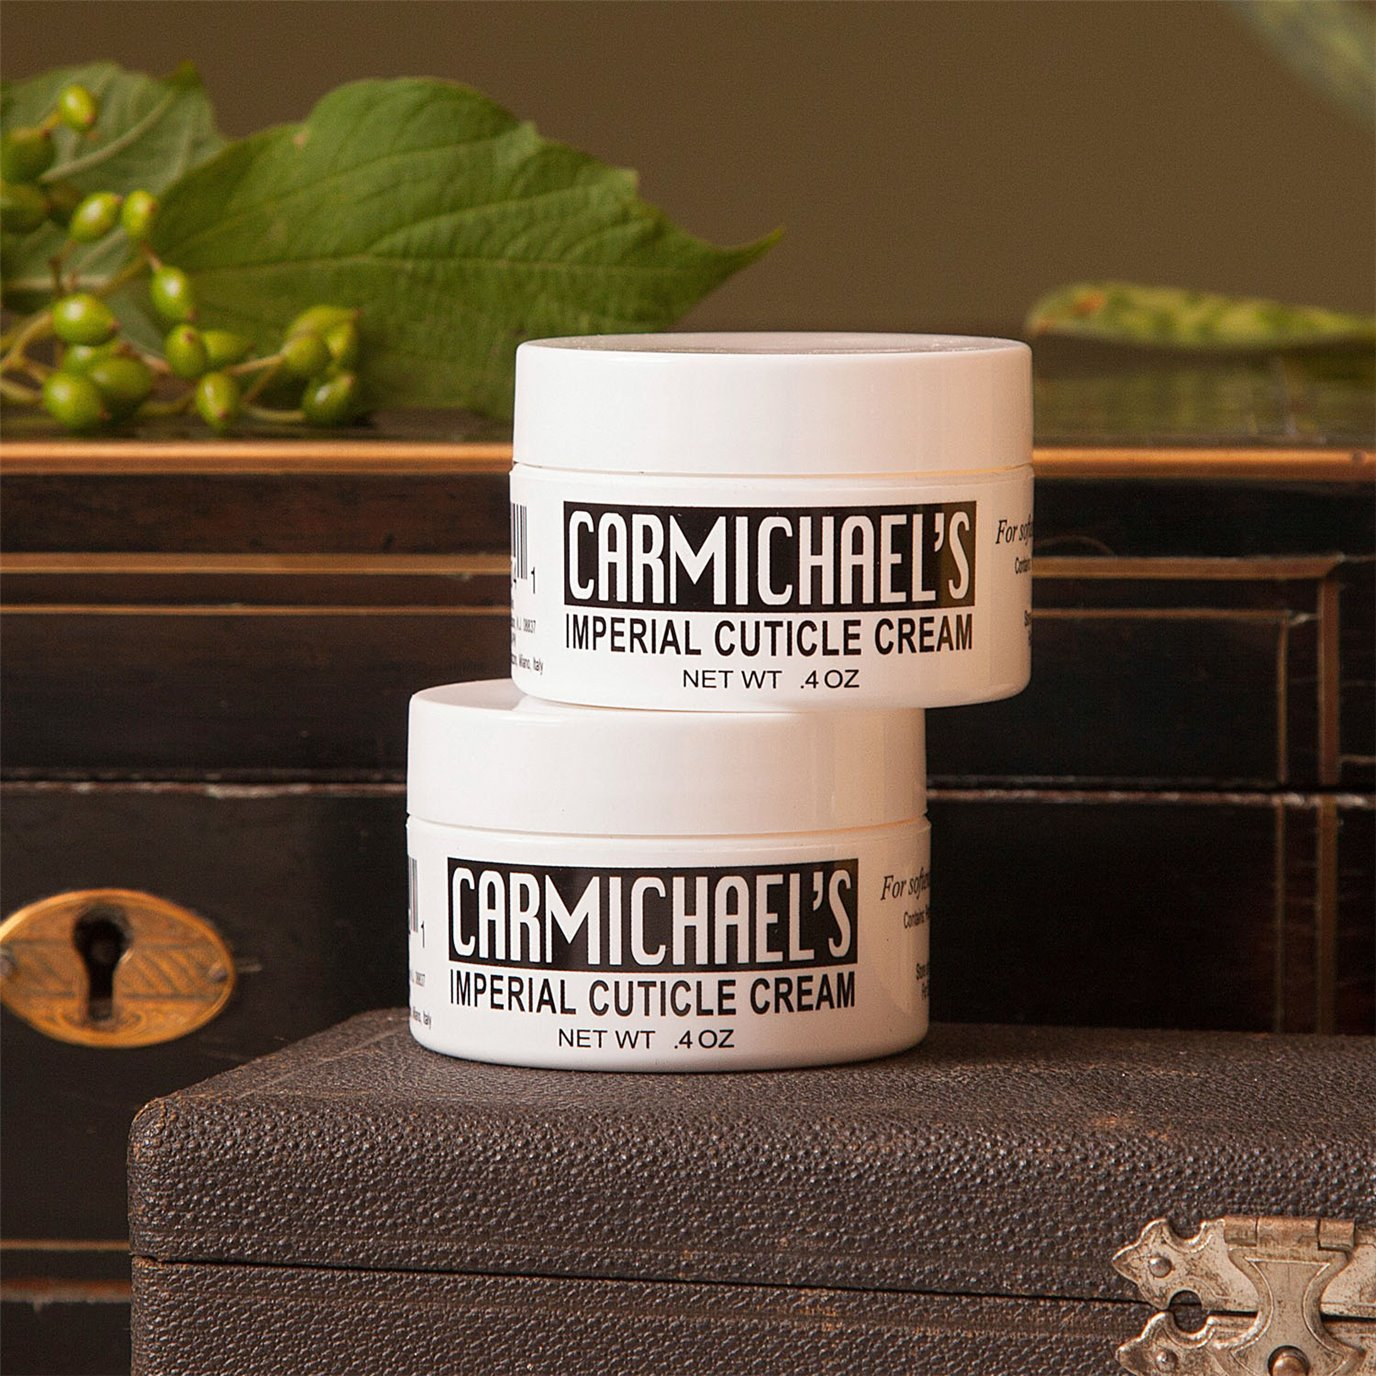 Caswell-Massey Carmichael's Cuticle Cream